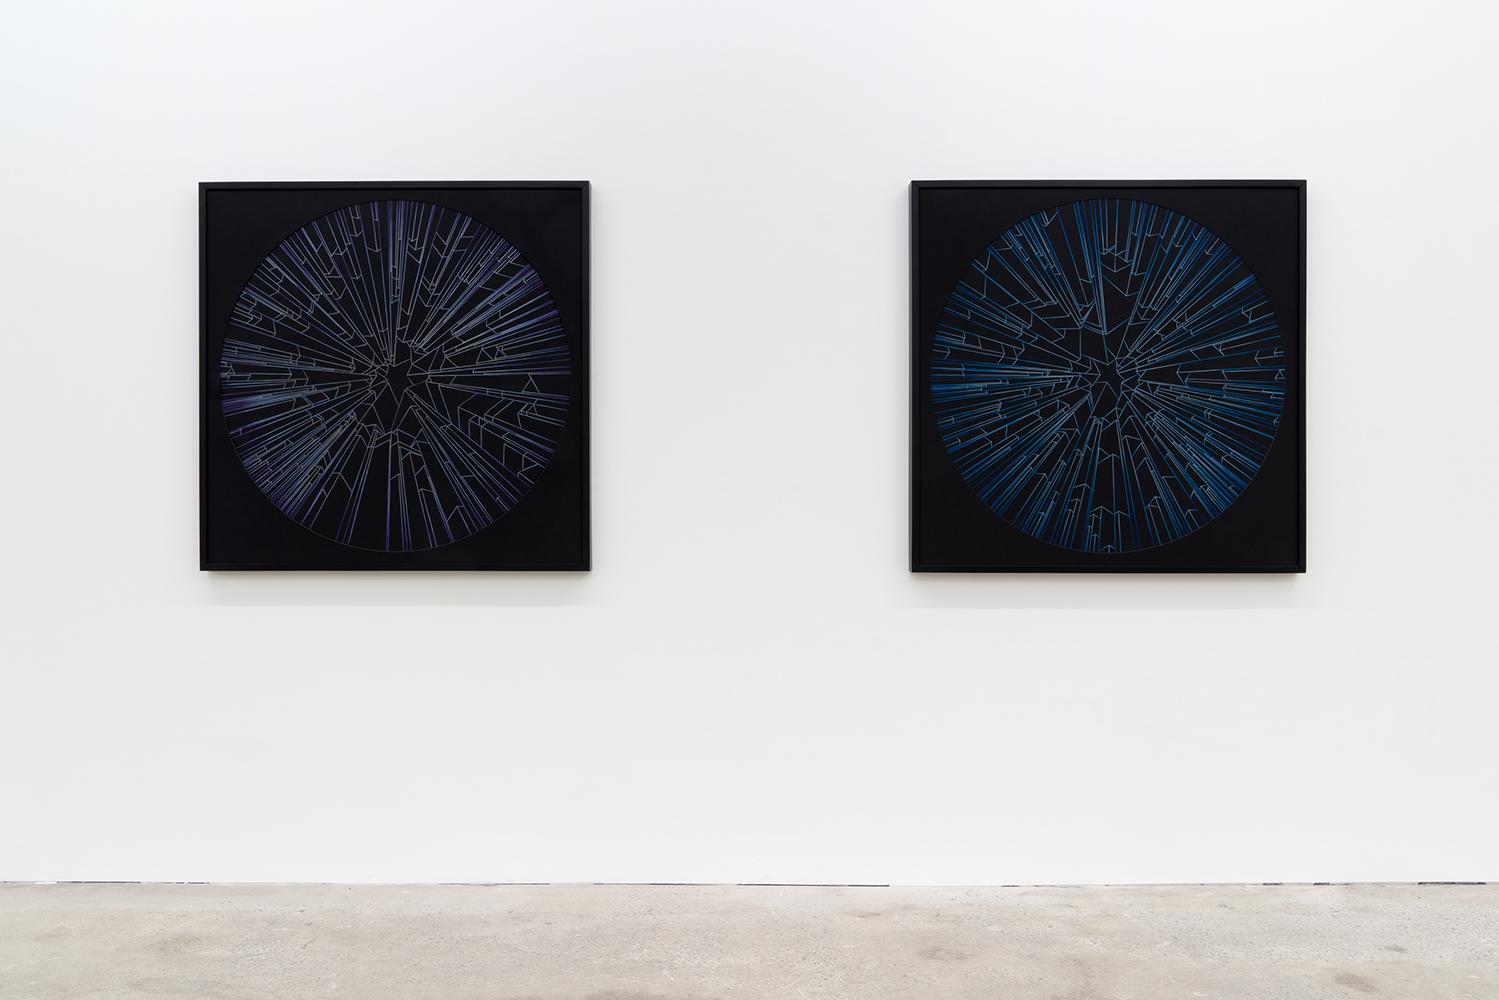 Caroline Cloutier, Série  Architectures célestes , 2015. Photo: Jean-Michel Seminaro